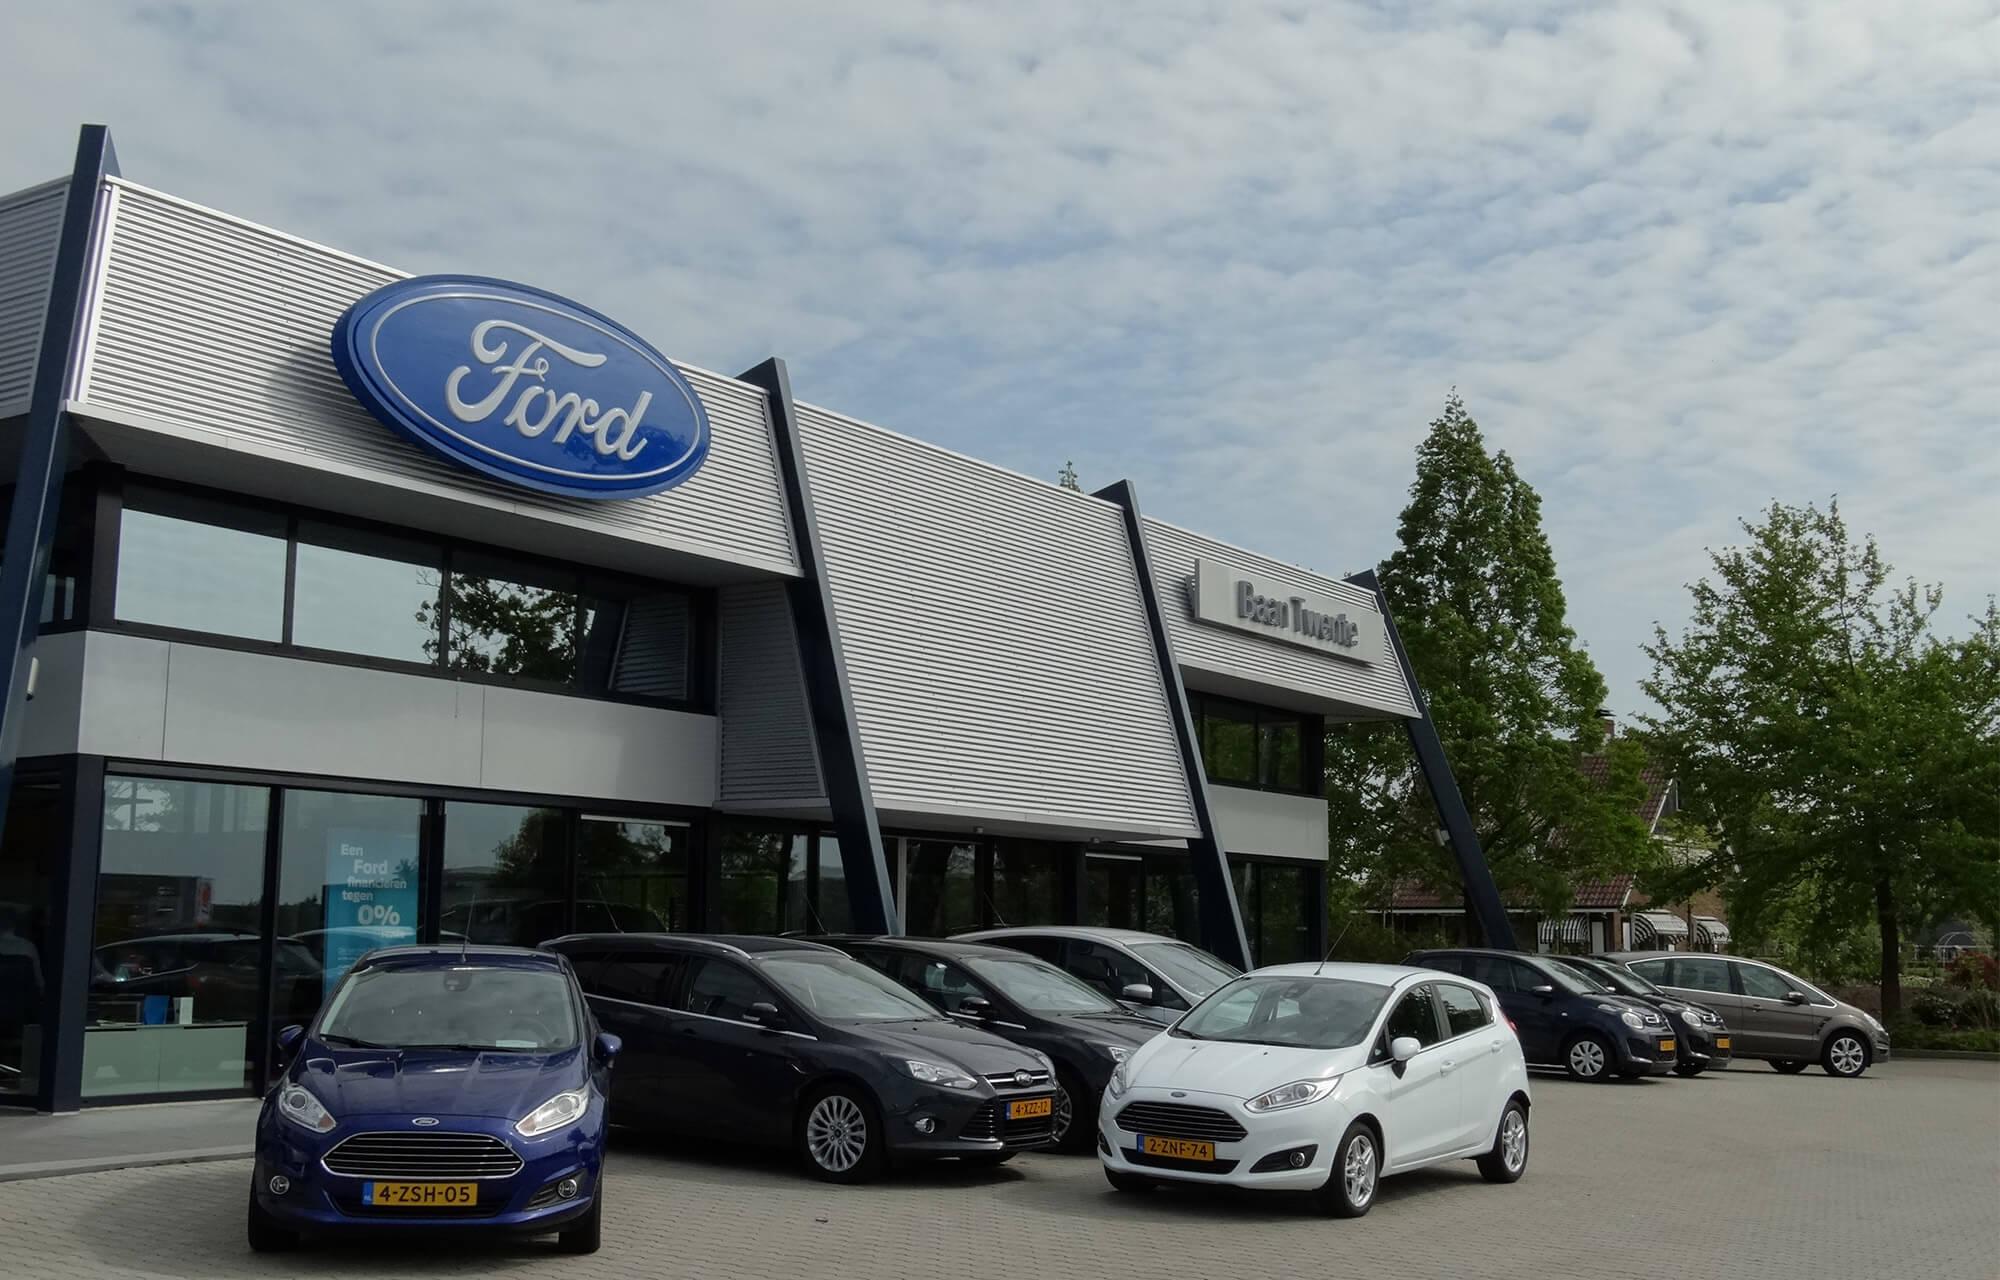 Ford Noordegraaf Rijssen meets Almelo